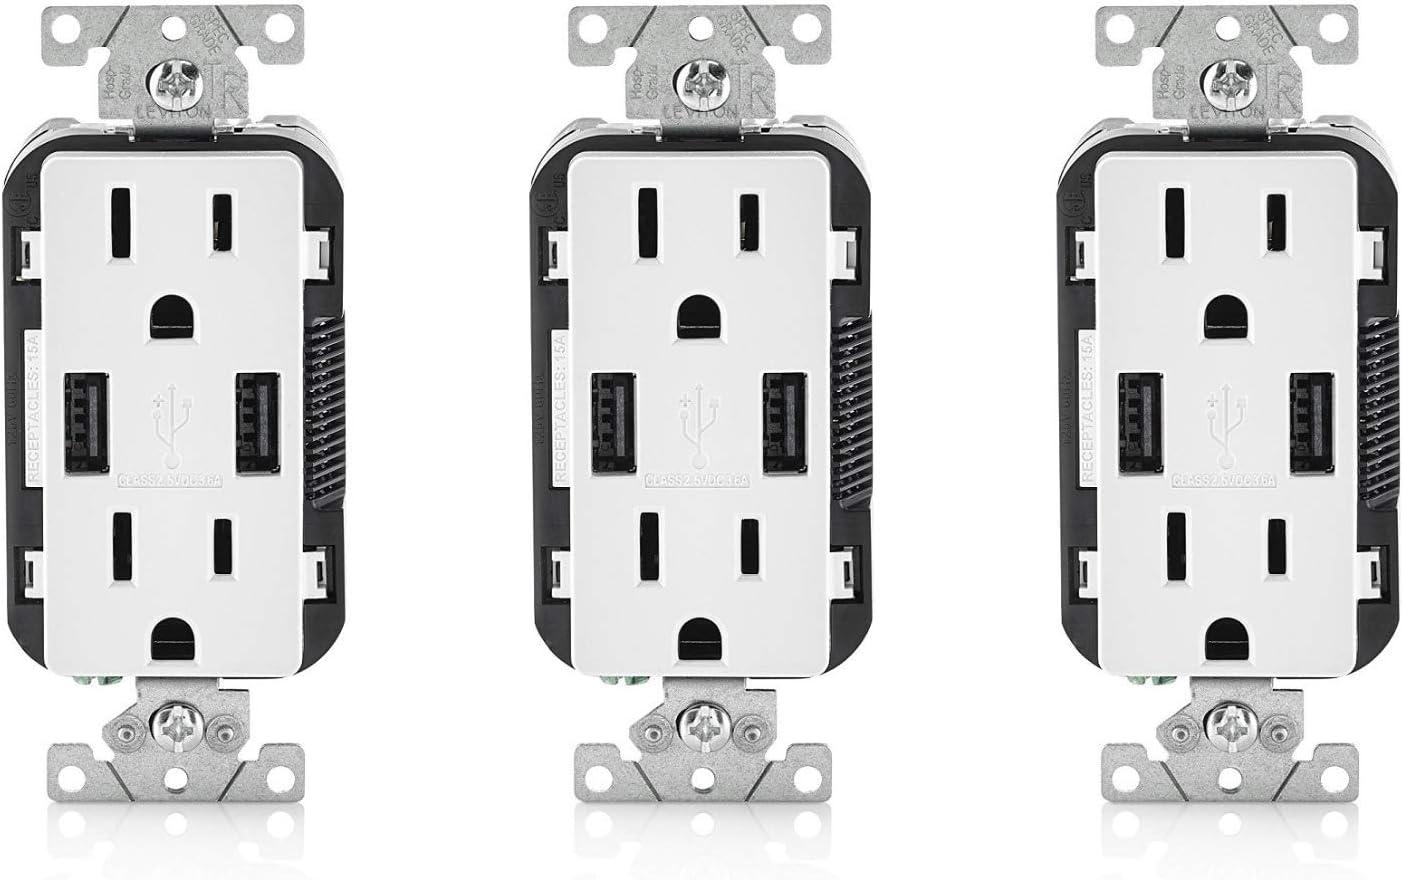 Leviton T5632-3BW 15-Amp USB Latest Ranking TOP5 item Charger Duplex Resistant Rec Tamper